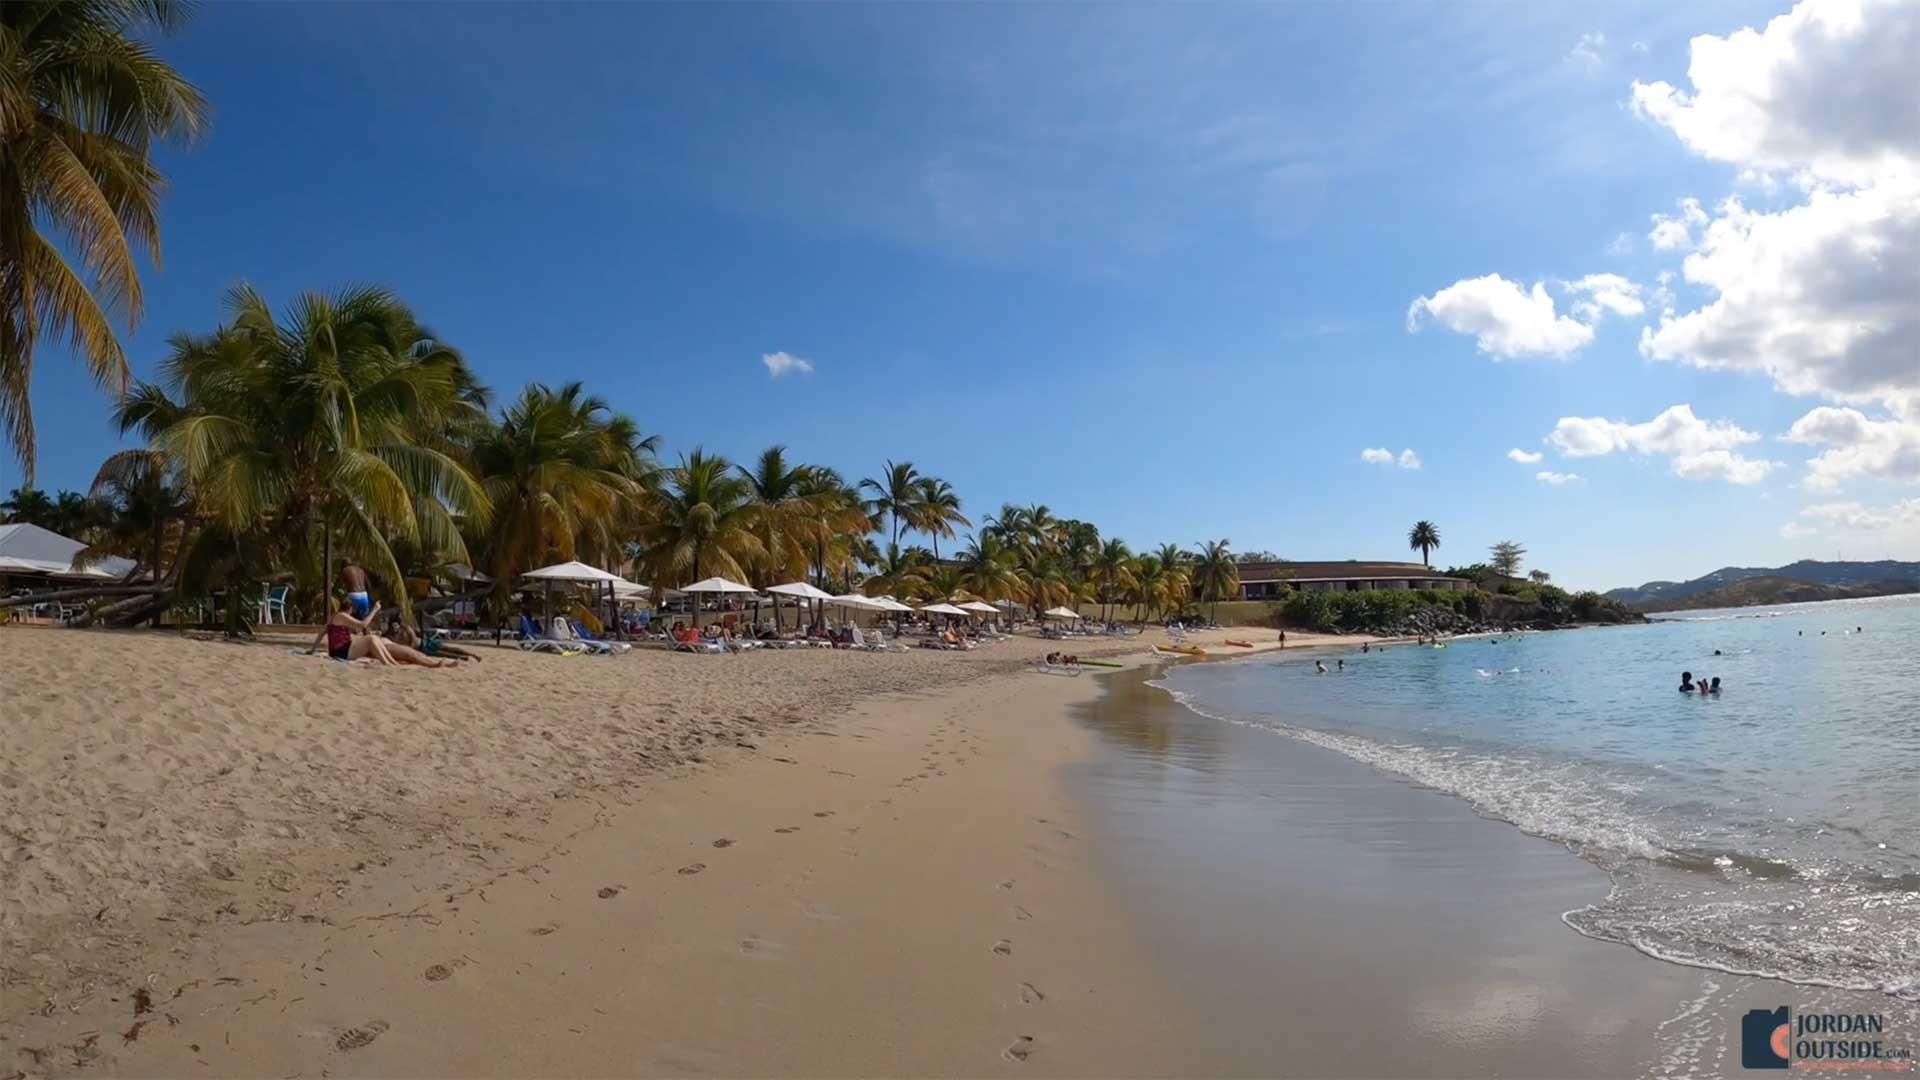 Mermaid Beach in St. Croix